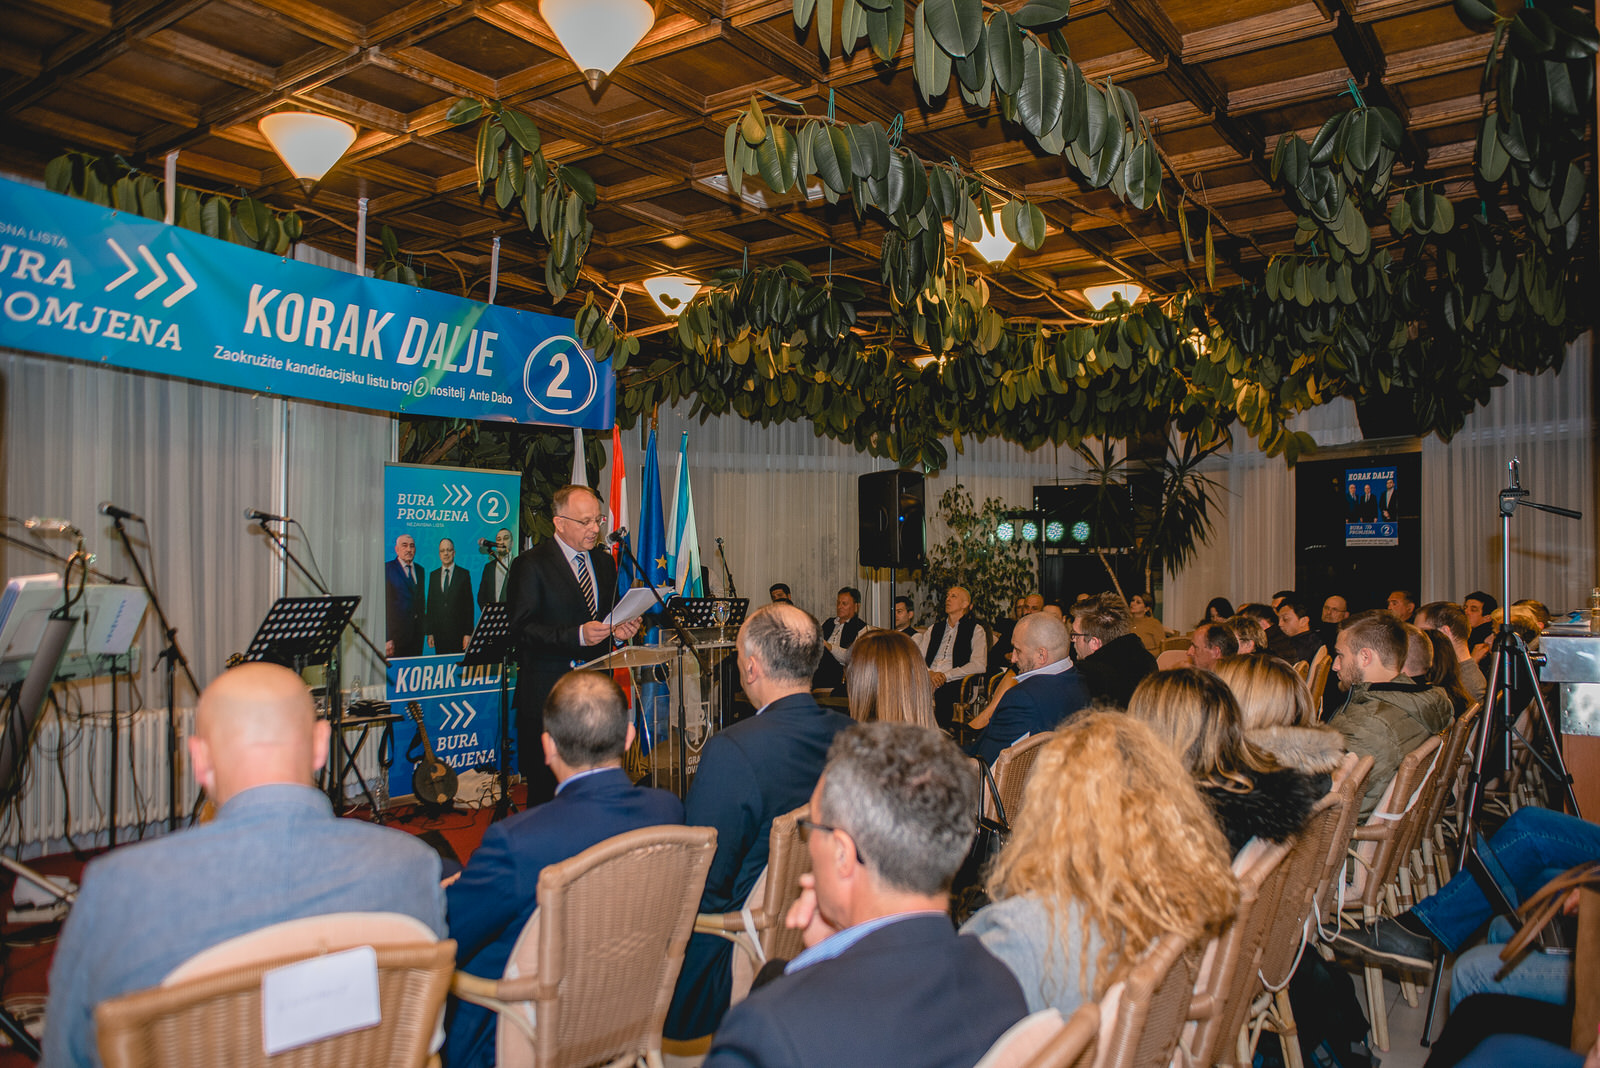 likaclub_bura-promjena_novalja_2019-25